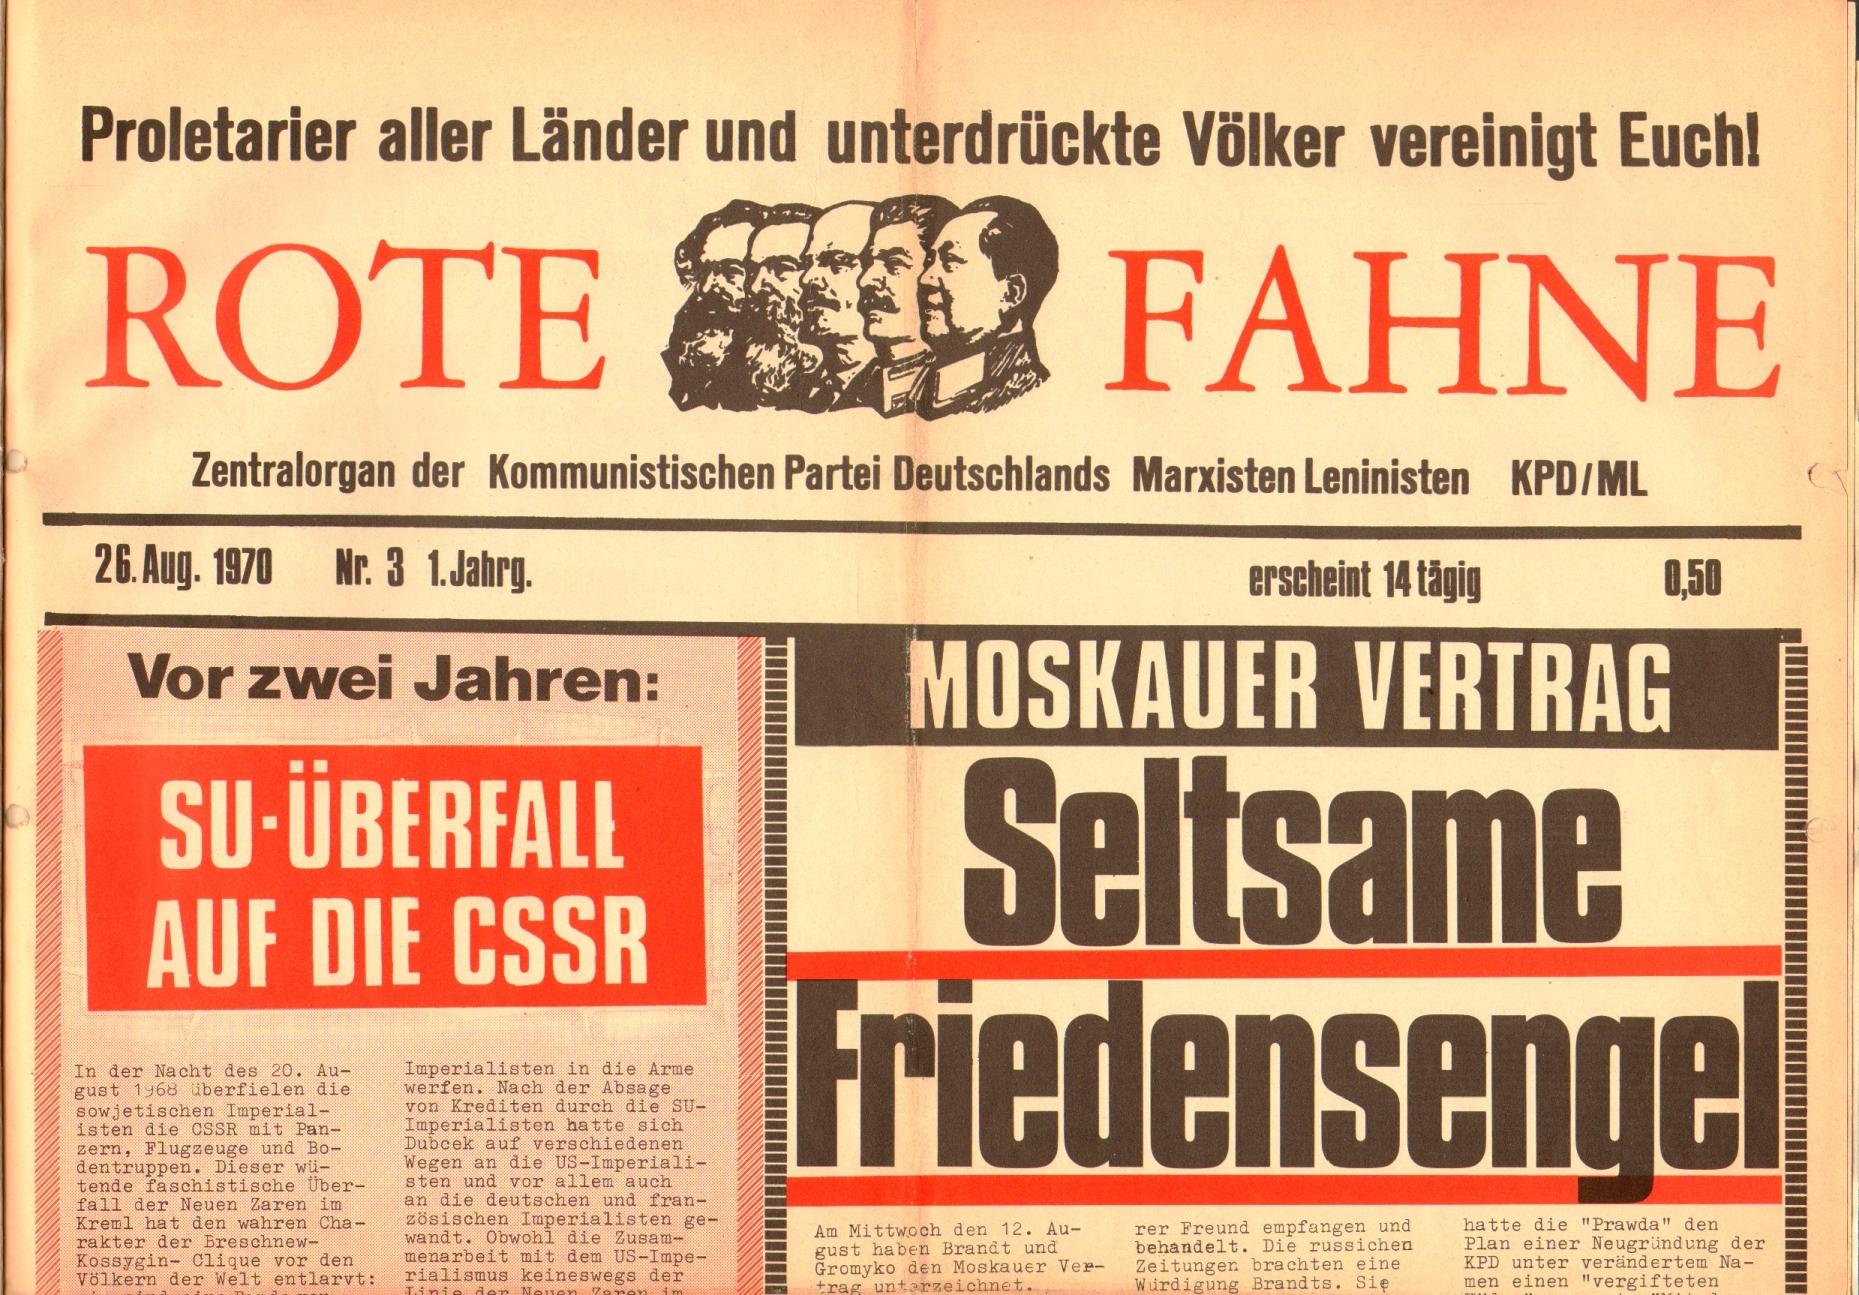 Rote Fahne, 1. Jg., 26. August 1970, Seite 1 oben